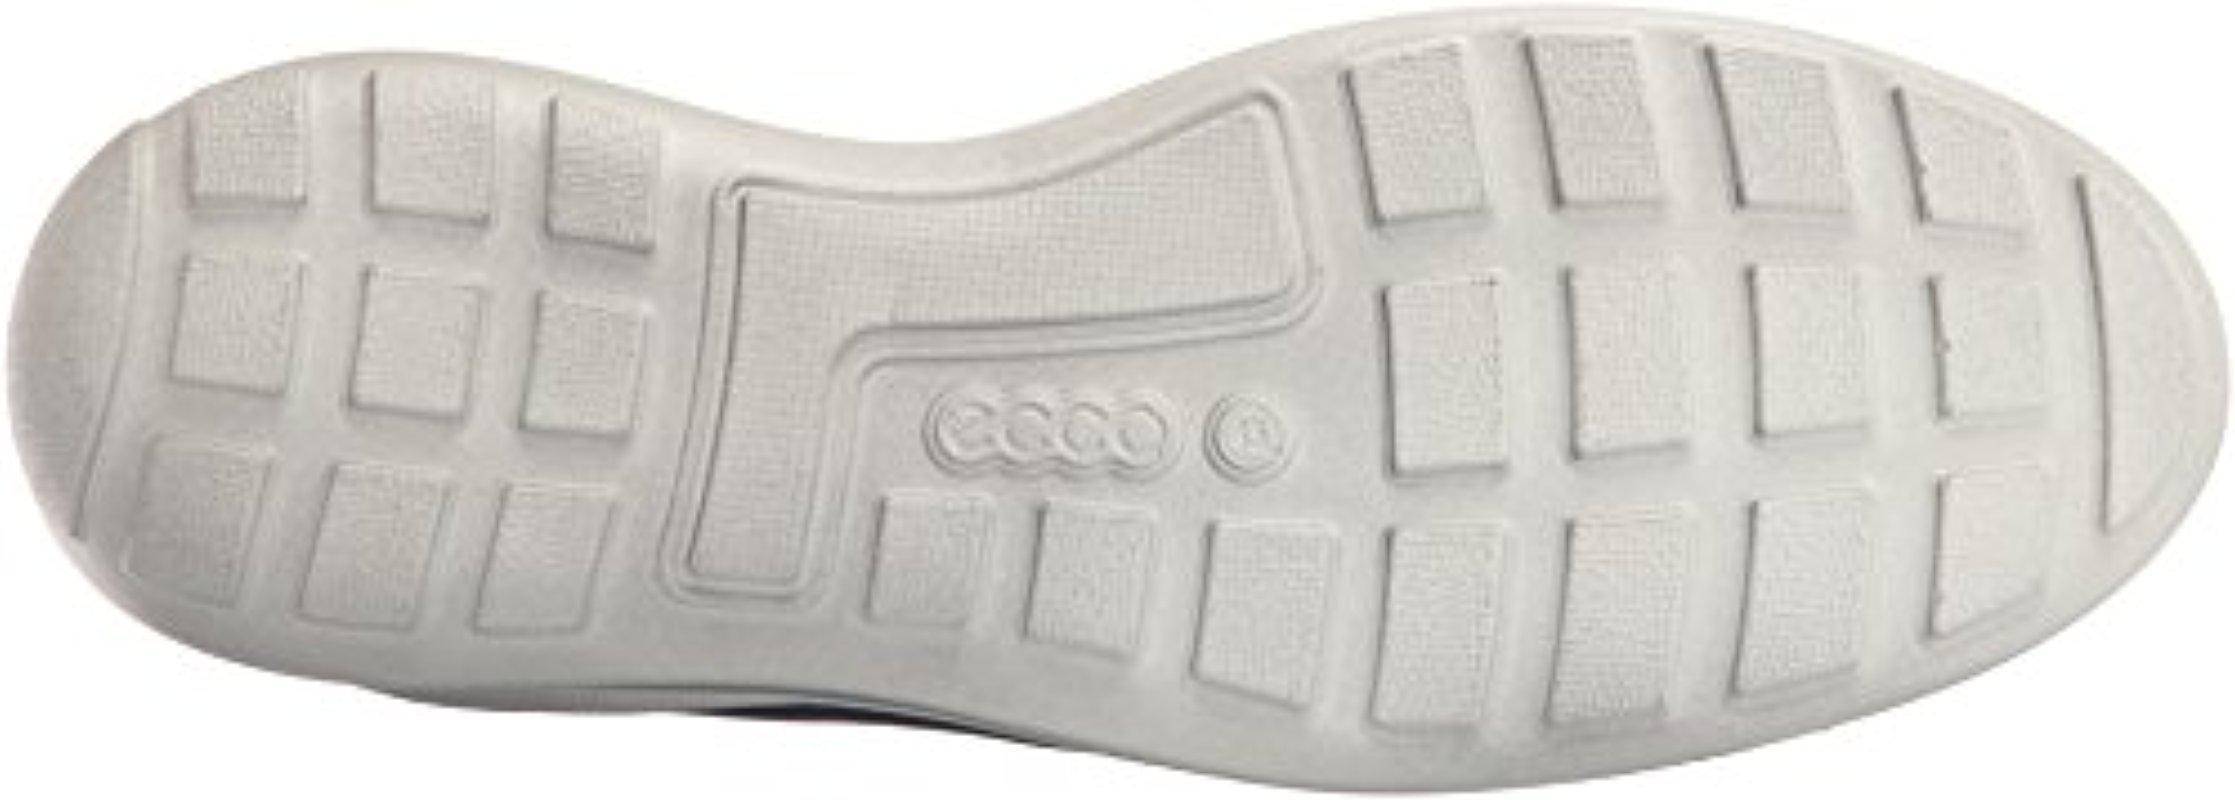 Lyst - Ecco Transit Tie Fashion Sneaker 646cab7f1